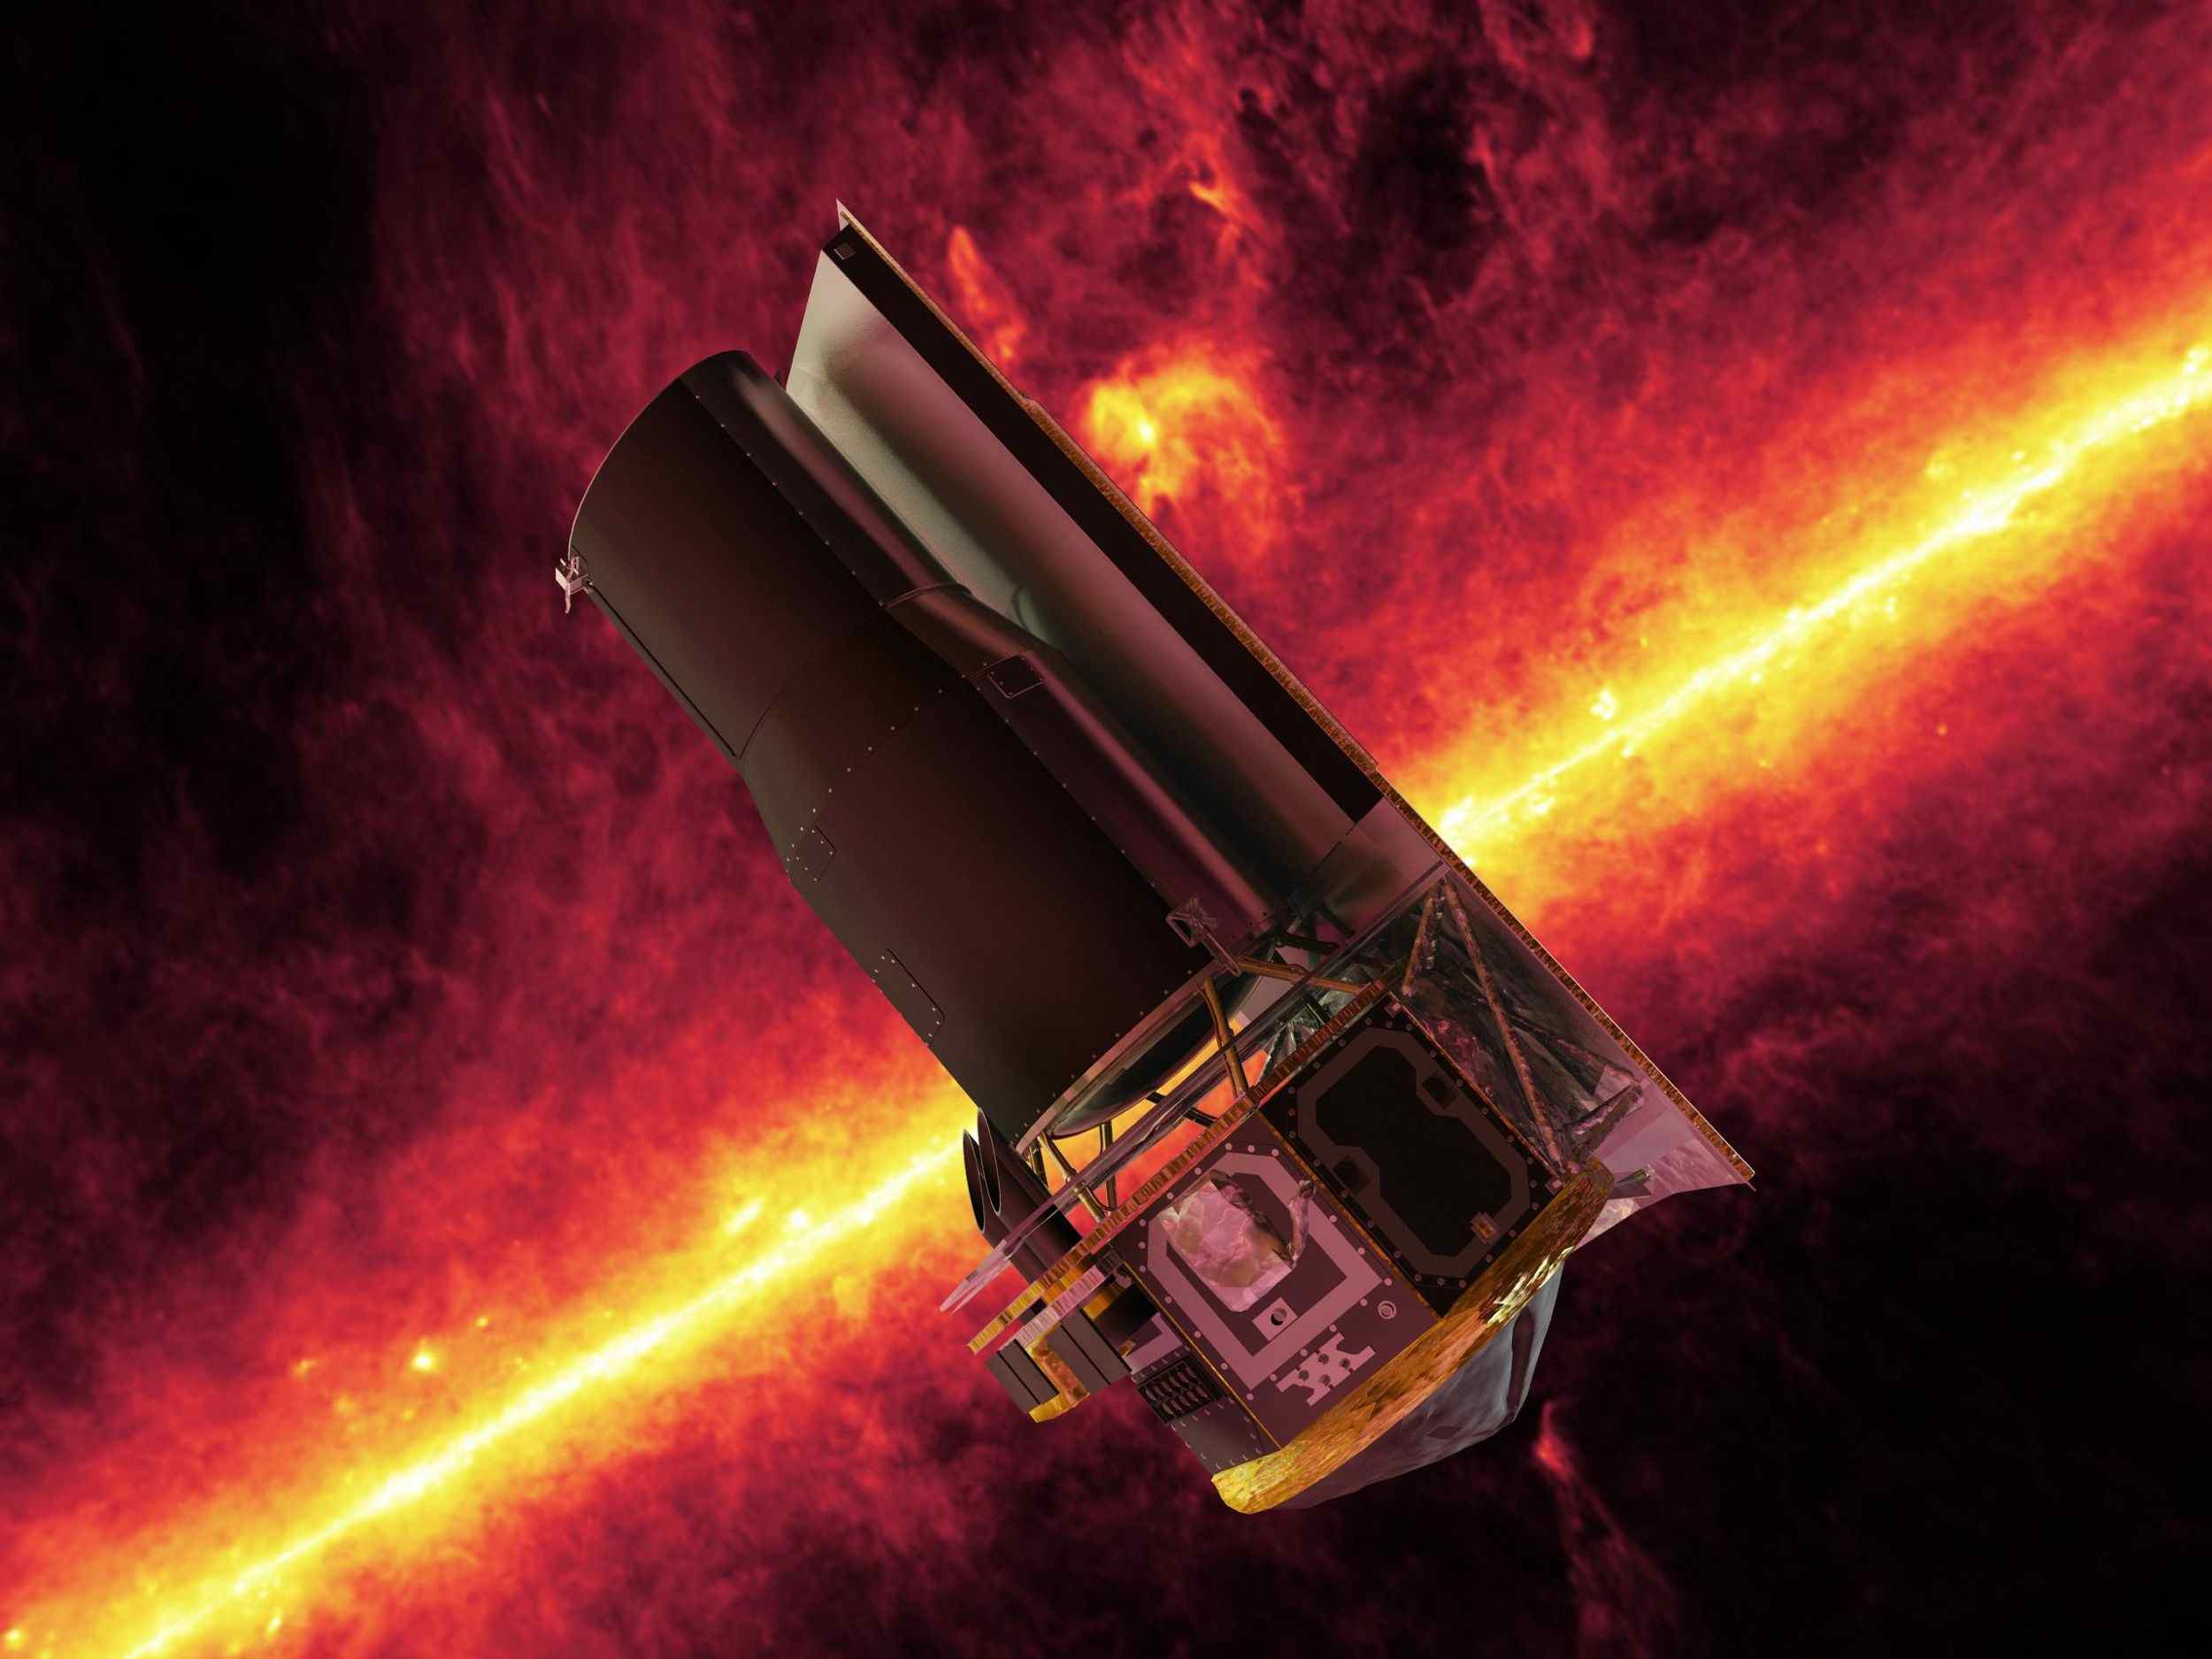 Saying Goodbye to the Spitzer Telescope